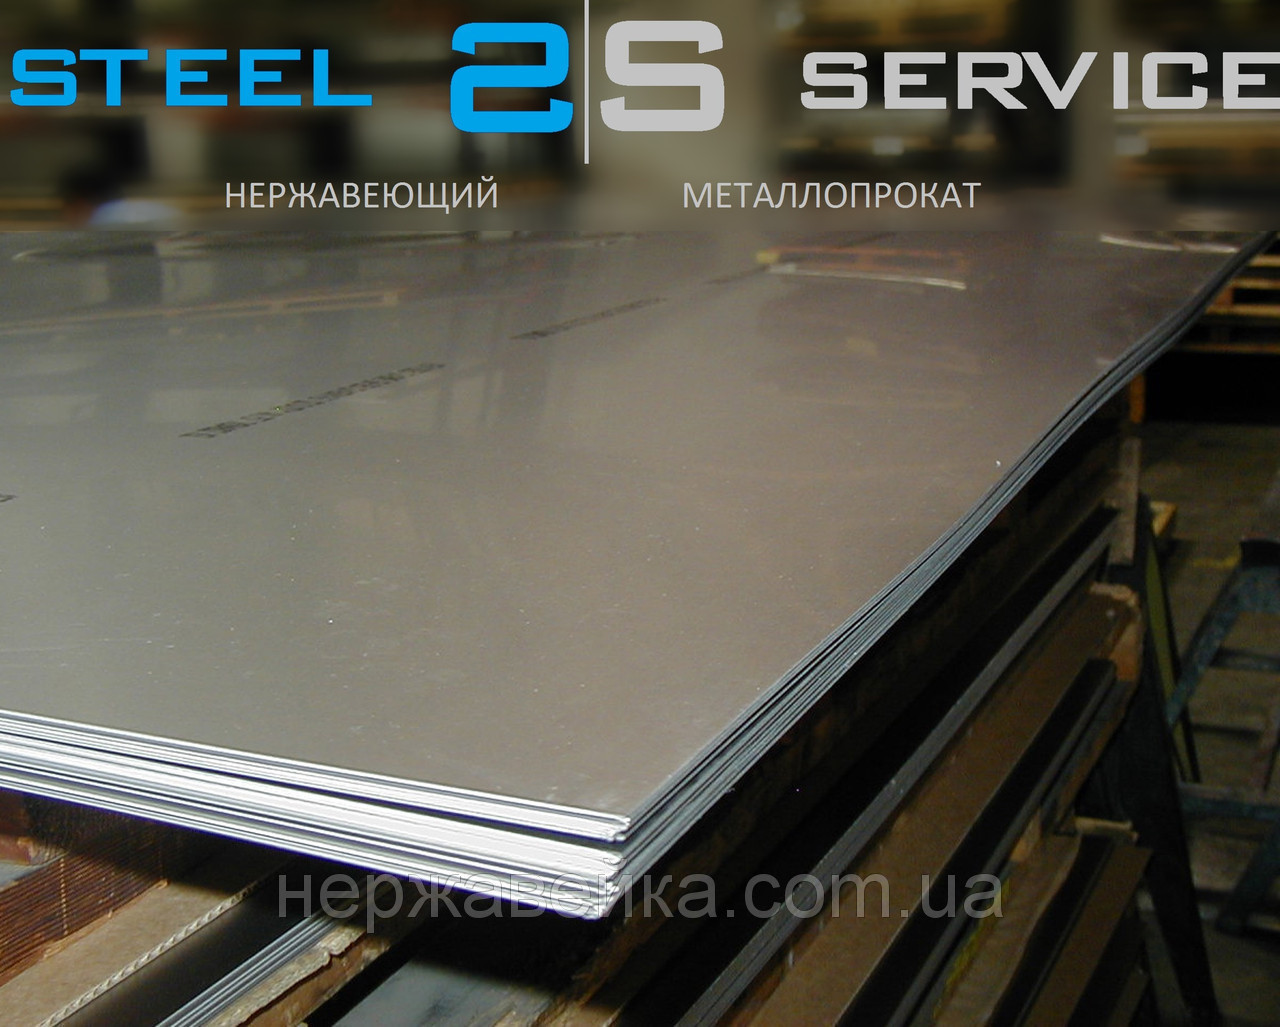 Нержавейка лист 4х1250х2500мм  AISI 321(08Х18Н10Т) 2B - матовый,  пищевой